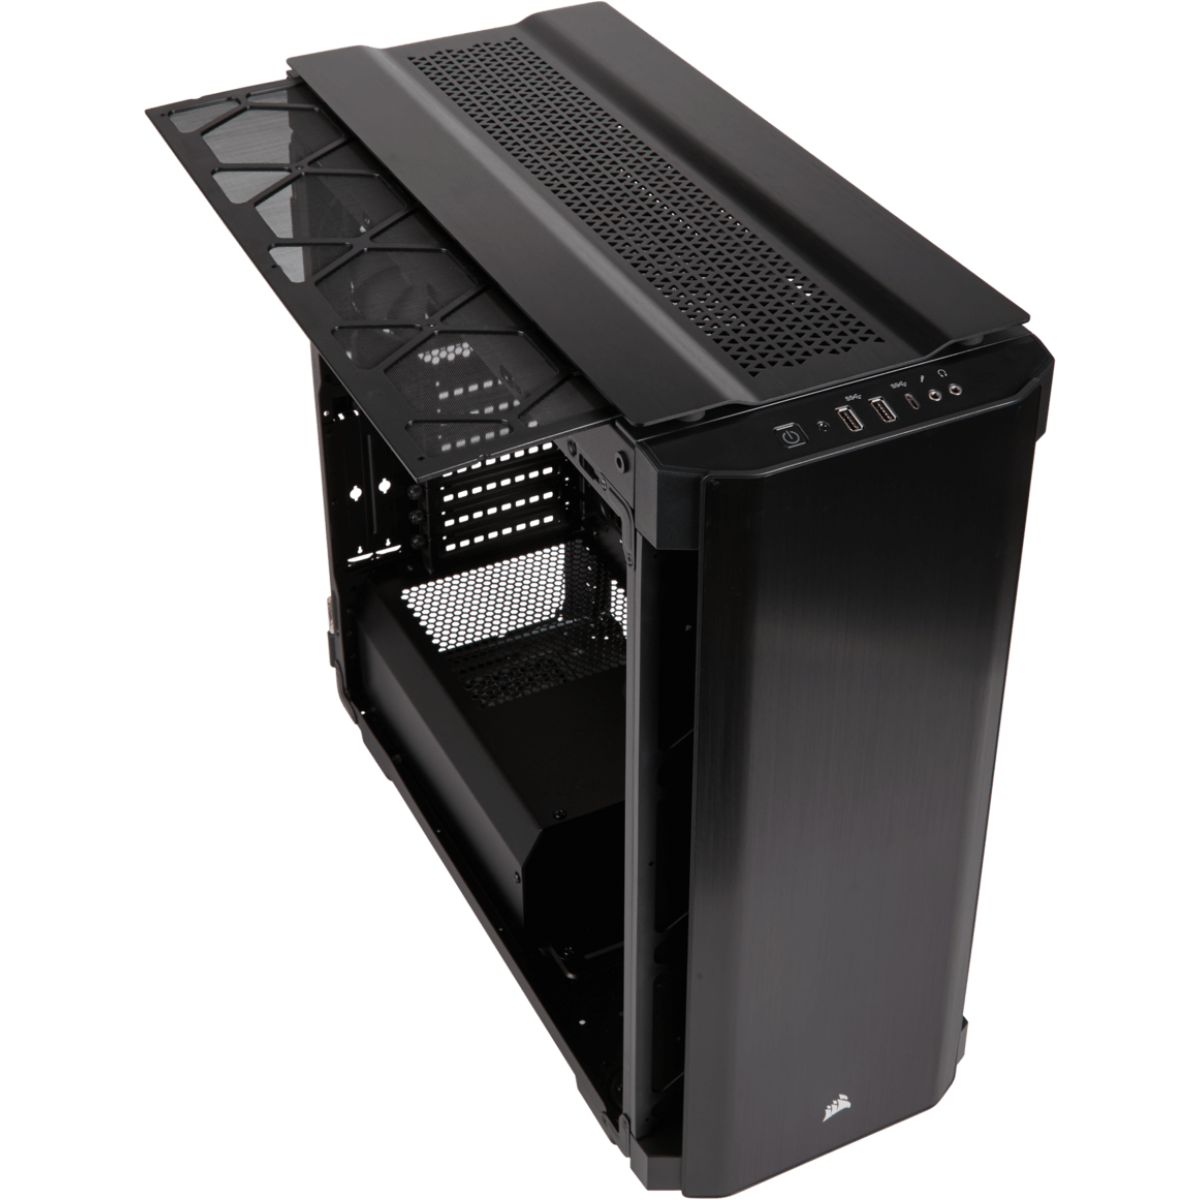 Gabinete Gamer Corsair Obsidian 500D, Mid Tower, Com 2 Fans, Vidro Temperado, Black, Sem Fonte, CC-9011116-WW